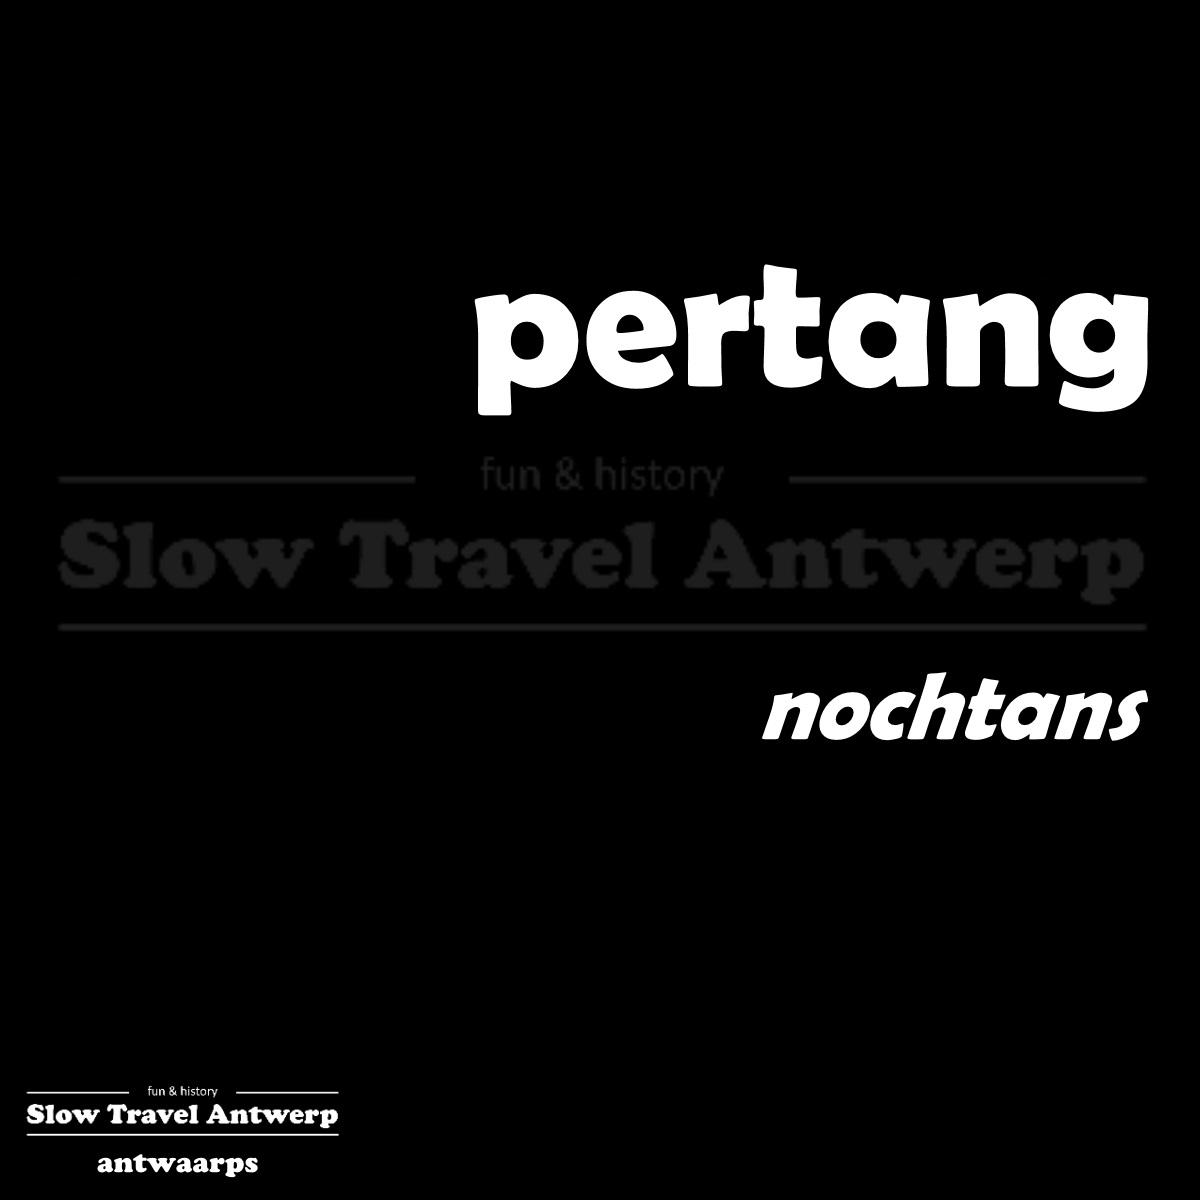 pertang – nochtans – nevertheless